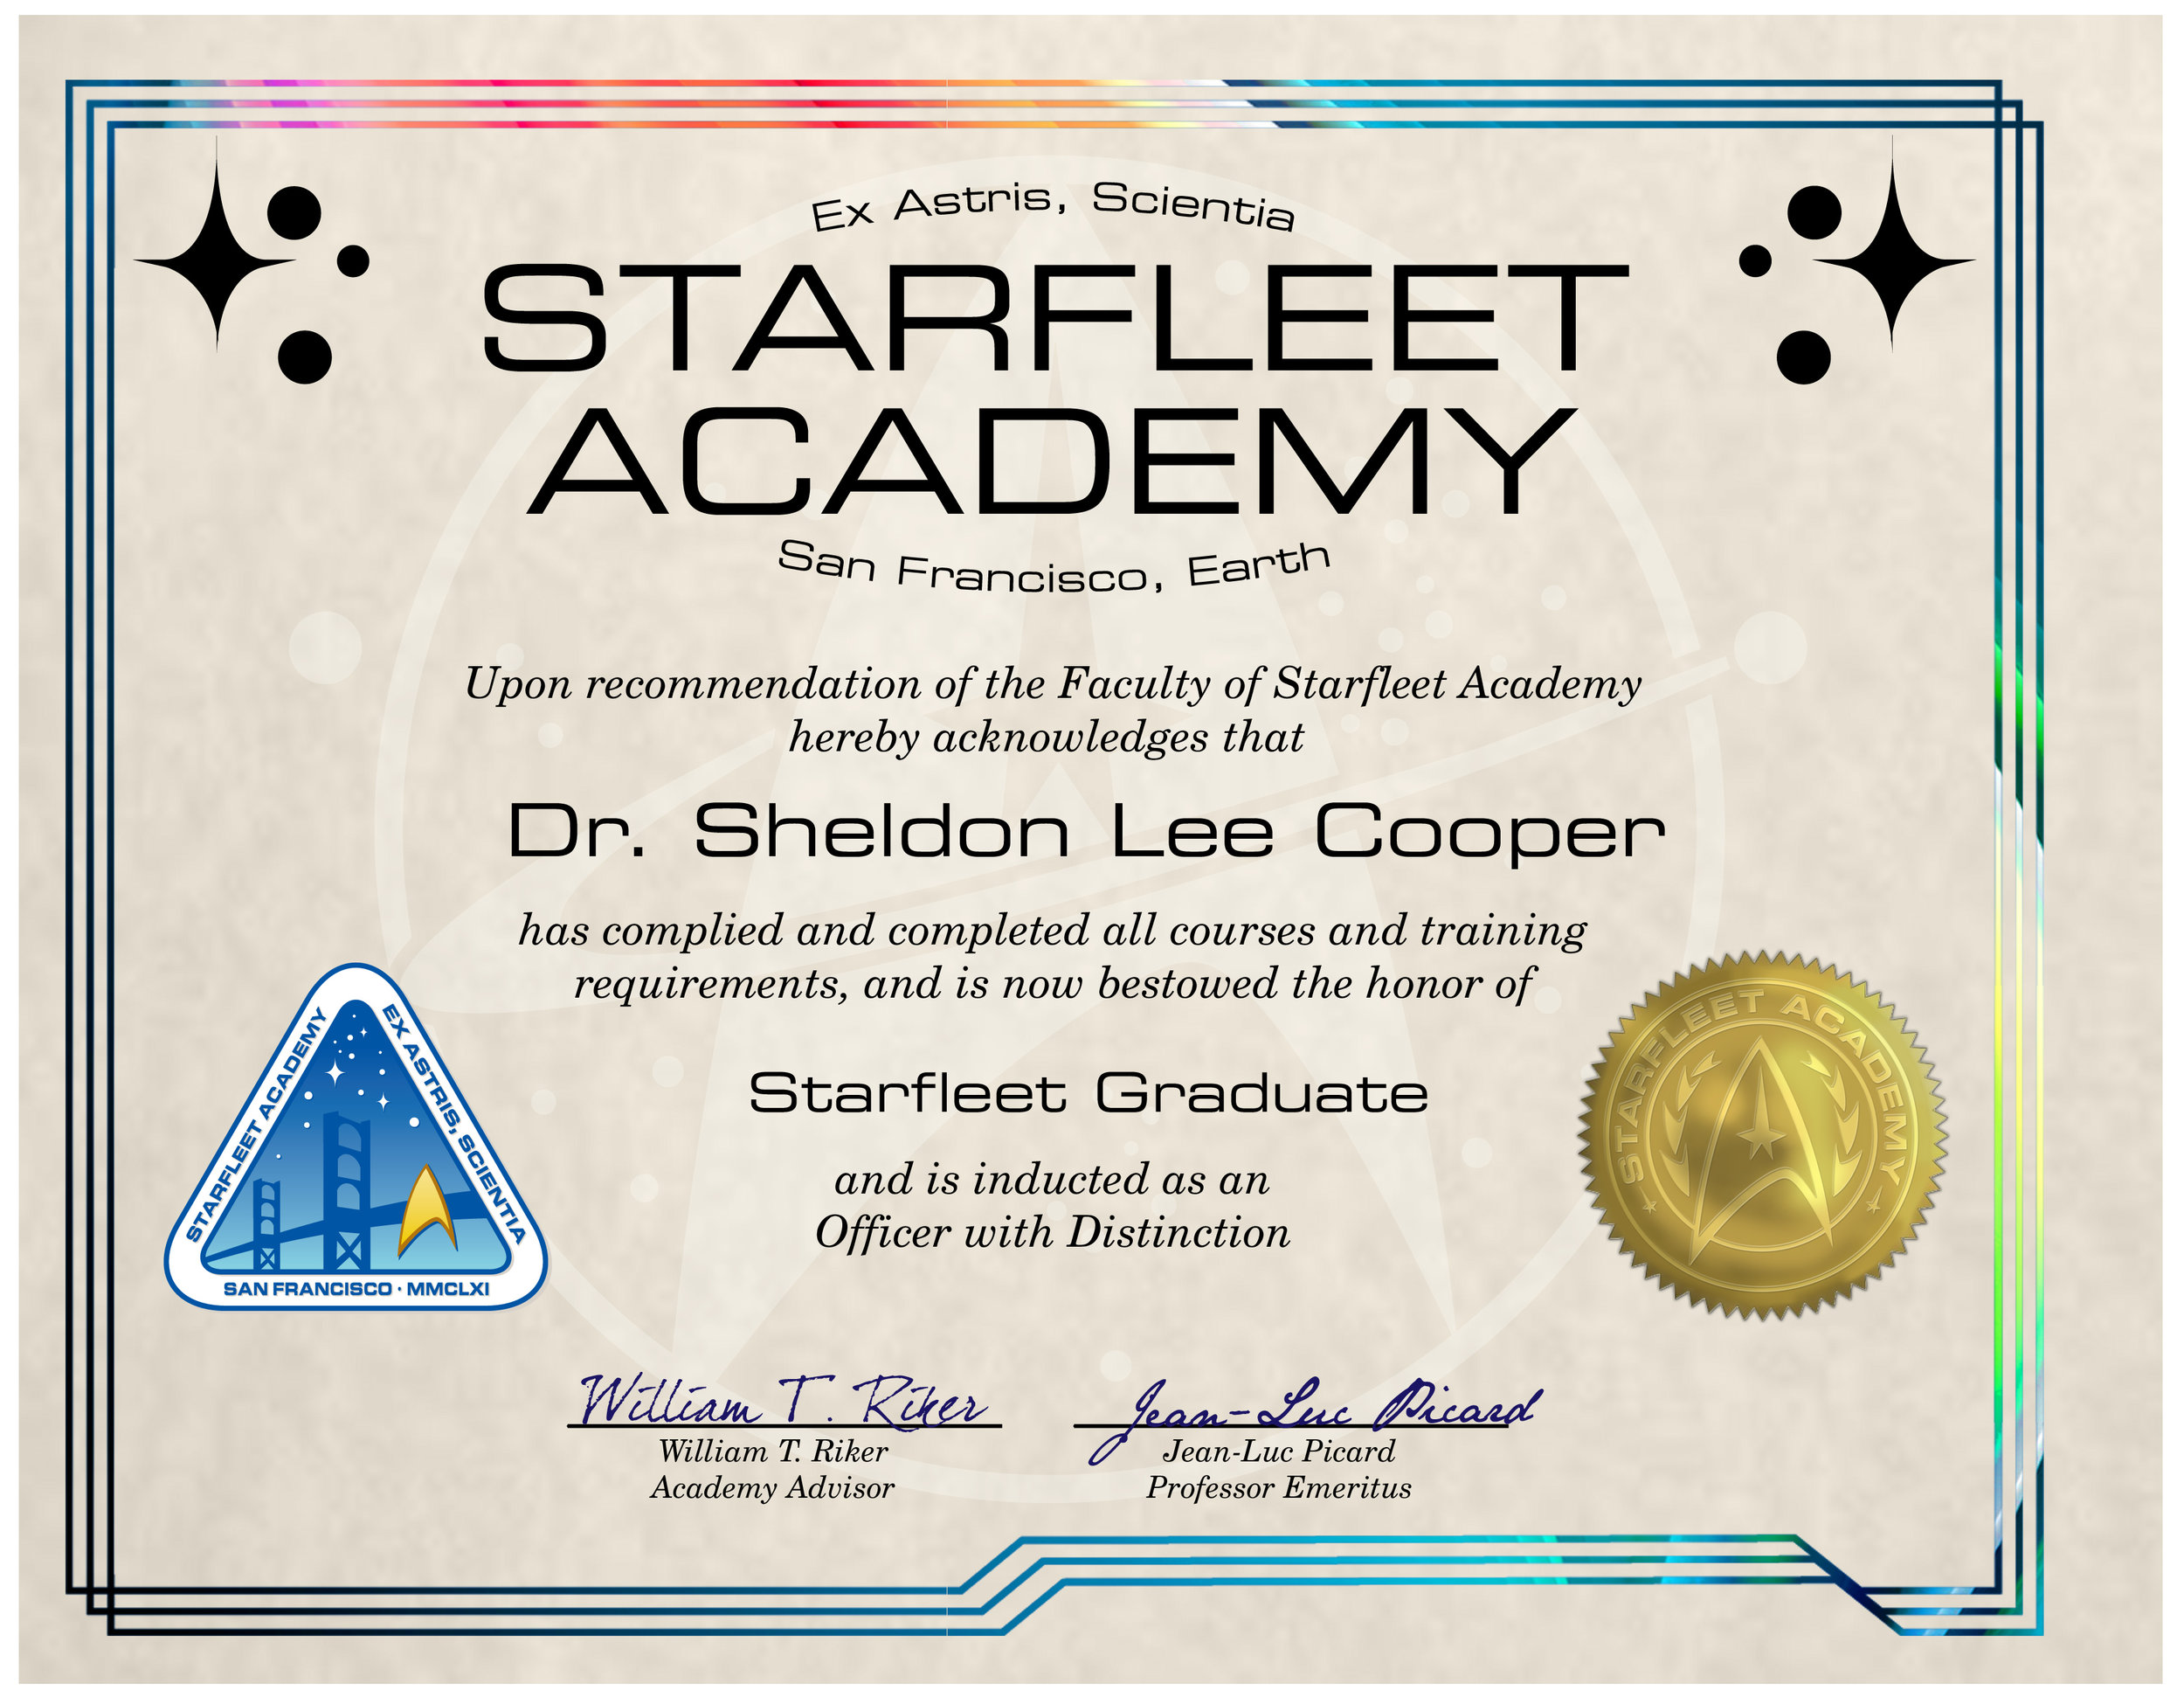 starfleet-academy-diploma-02.jpg